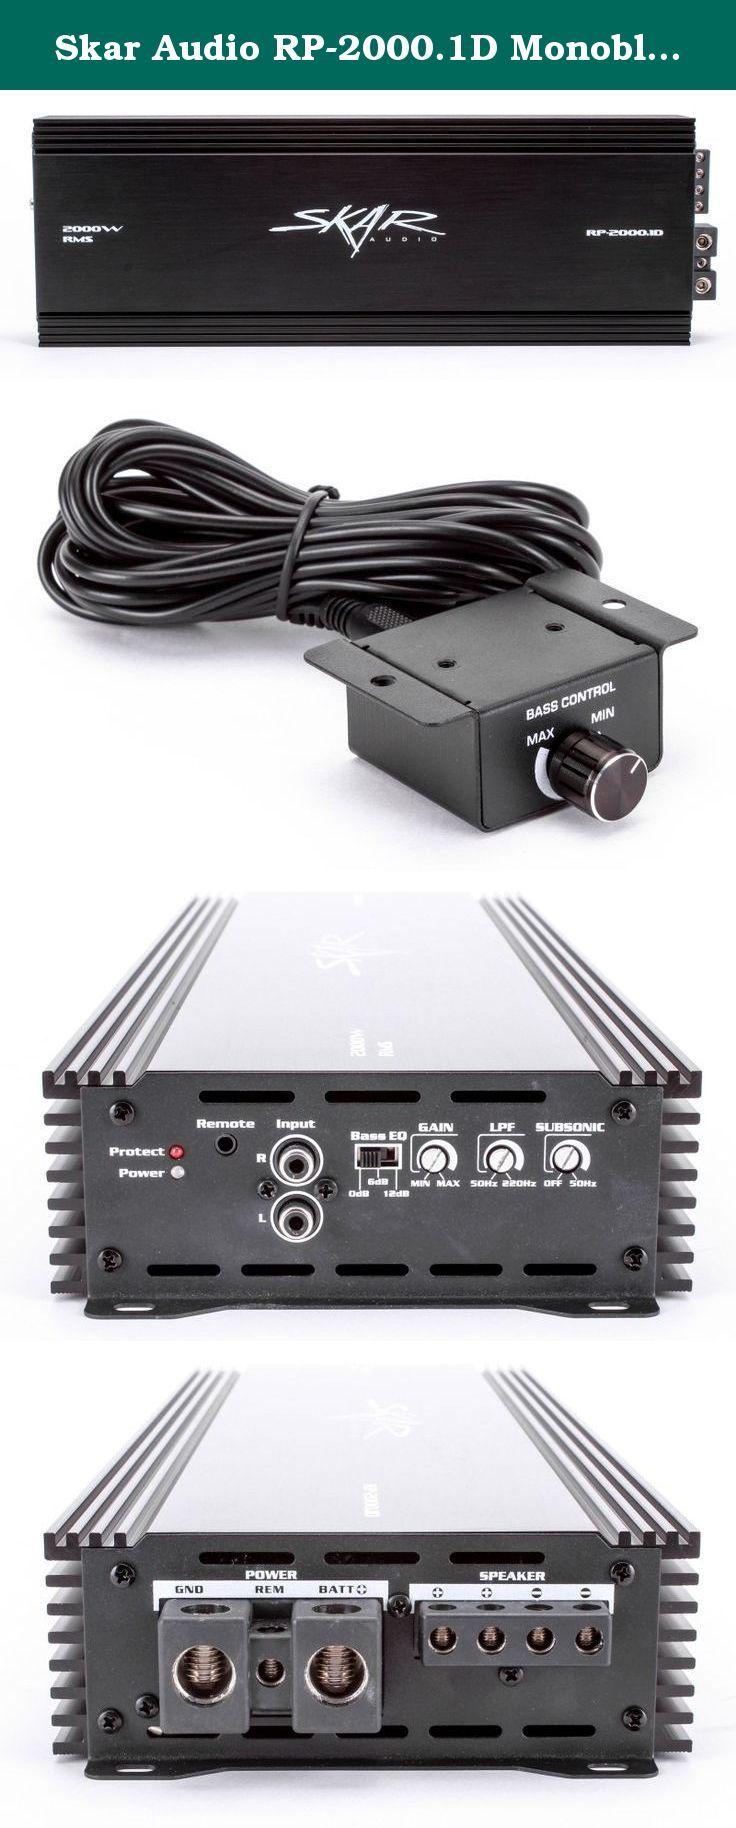 Skar Audio Rp 20001d Monoblock 2000 Watt Class D Mo Mono Car Stereo Kit 800w Sub 500w 2 Channel Amplifier Capacitor Wiring Mosfet Subwoofer